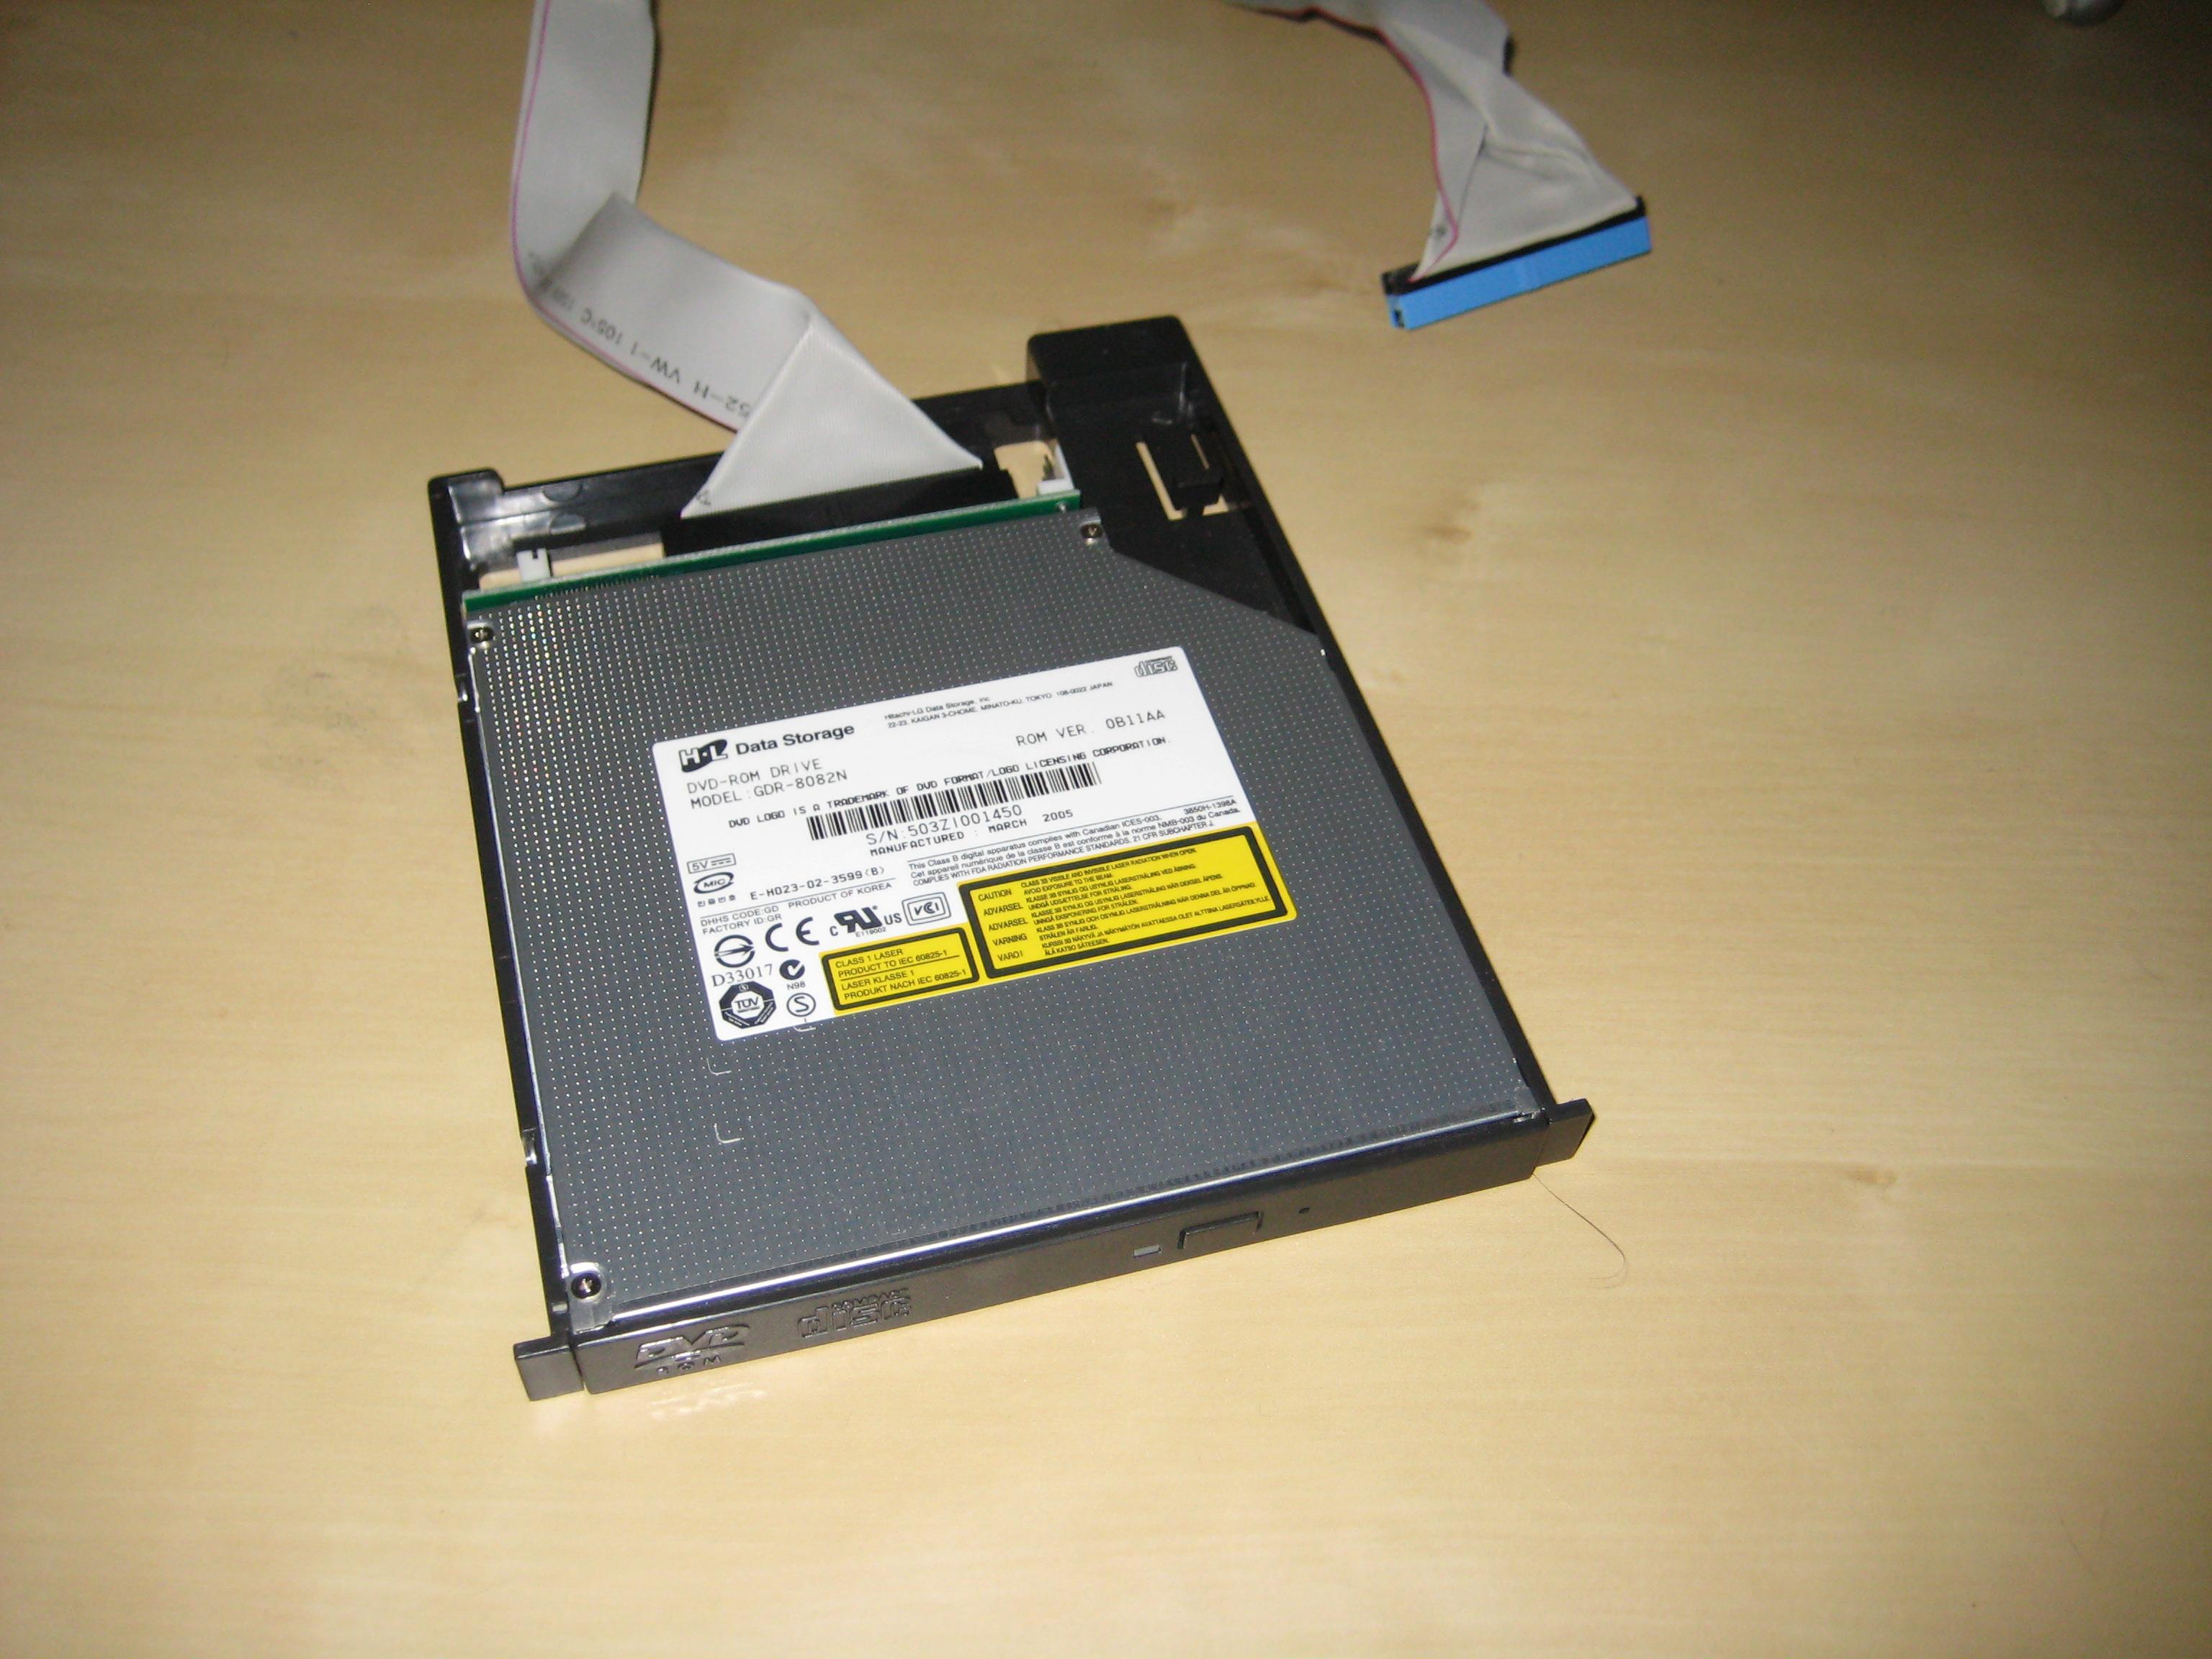 LG HL-DT-ST DVDRAM GSA-H12L DRIVERS FOR WINDOWS XP